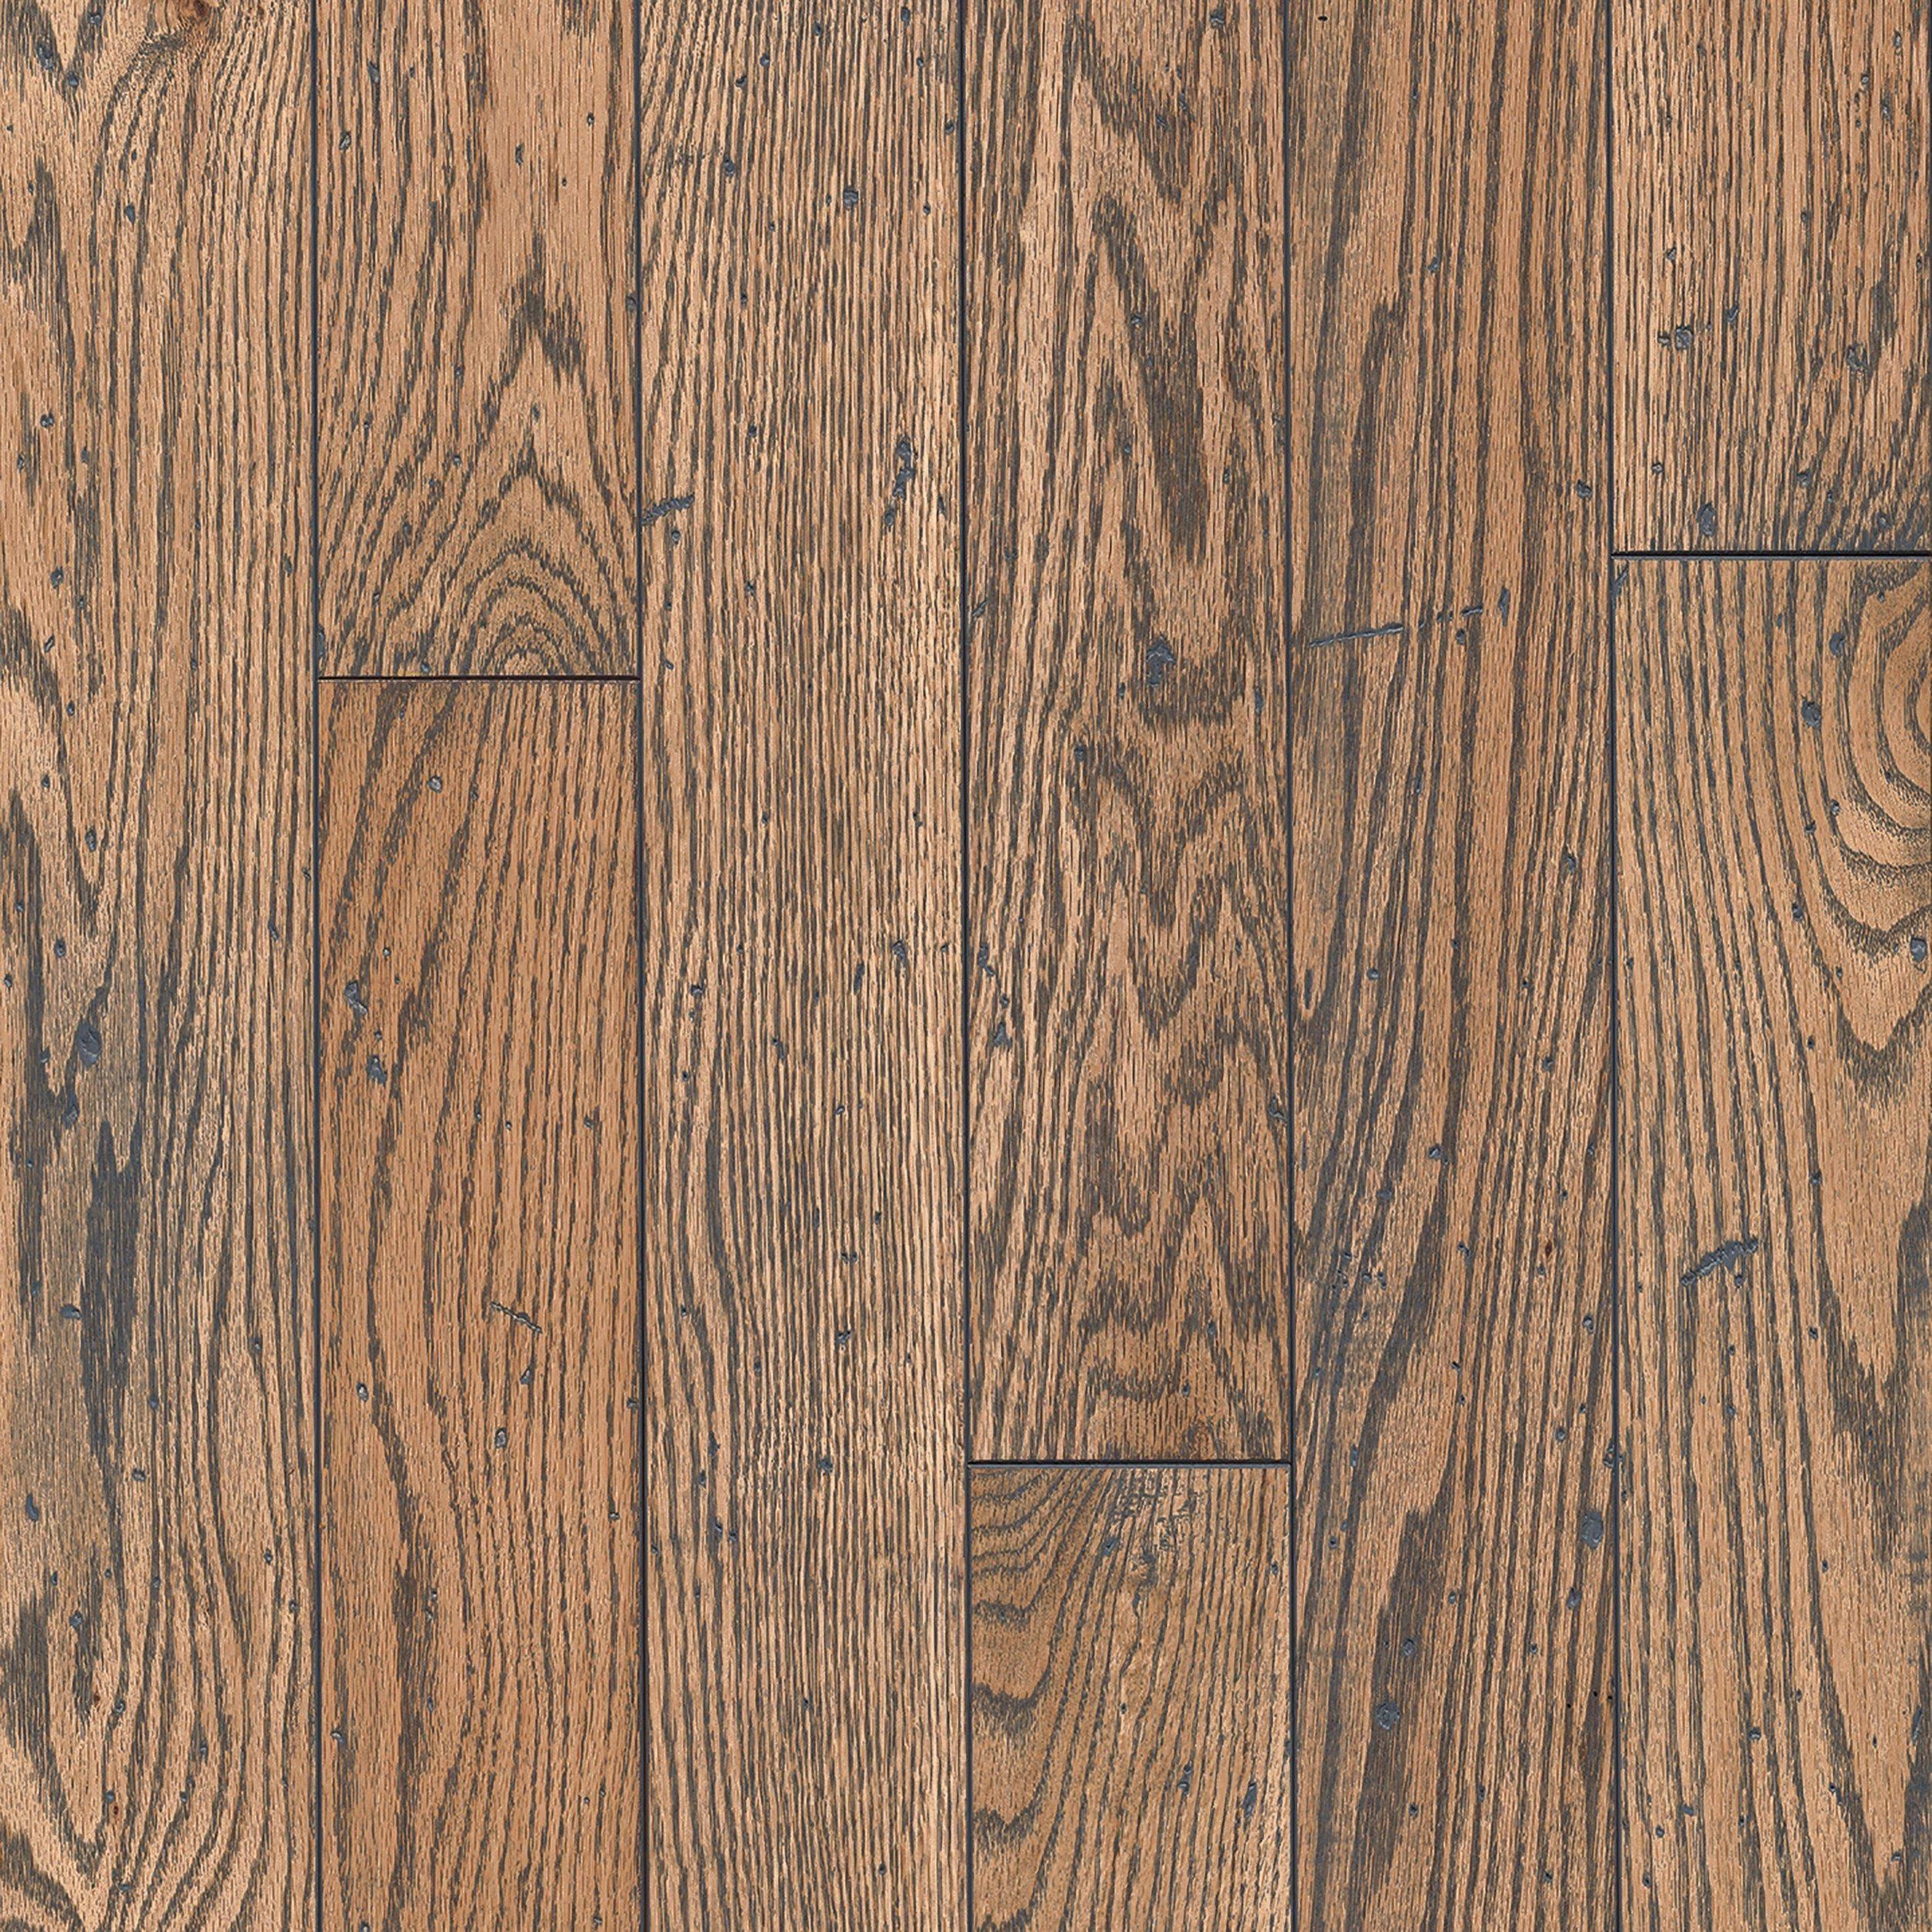 Natural Gray Oak Distressed Solid Hardwood Hardwood Grey Oak